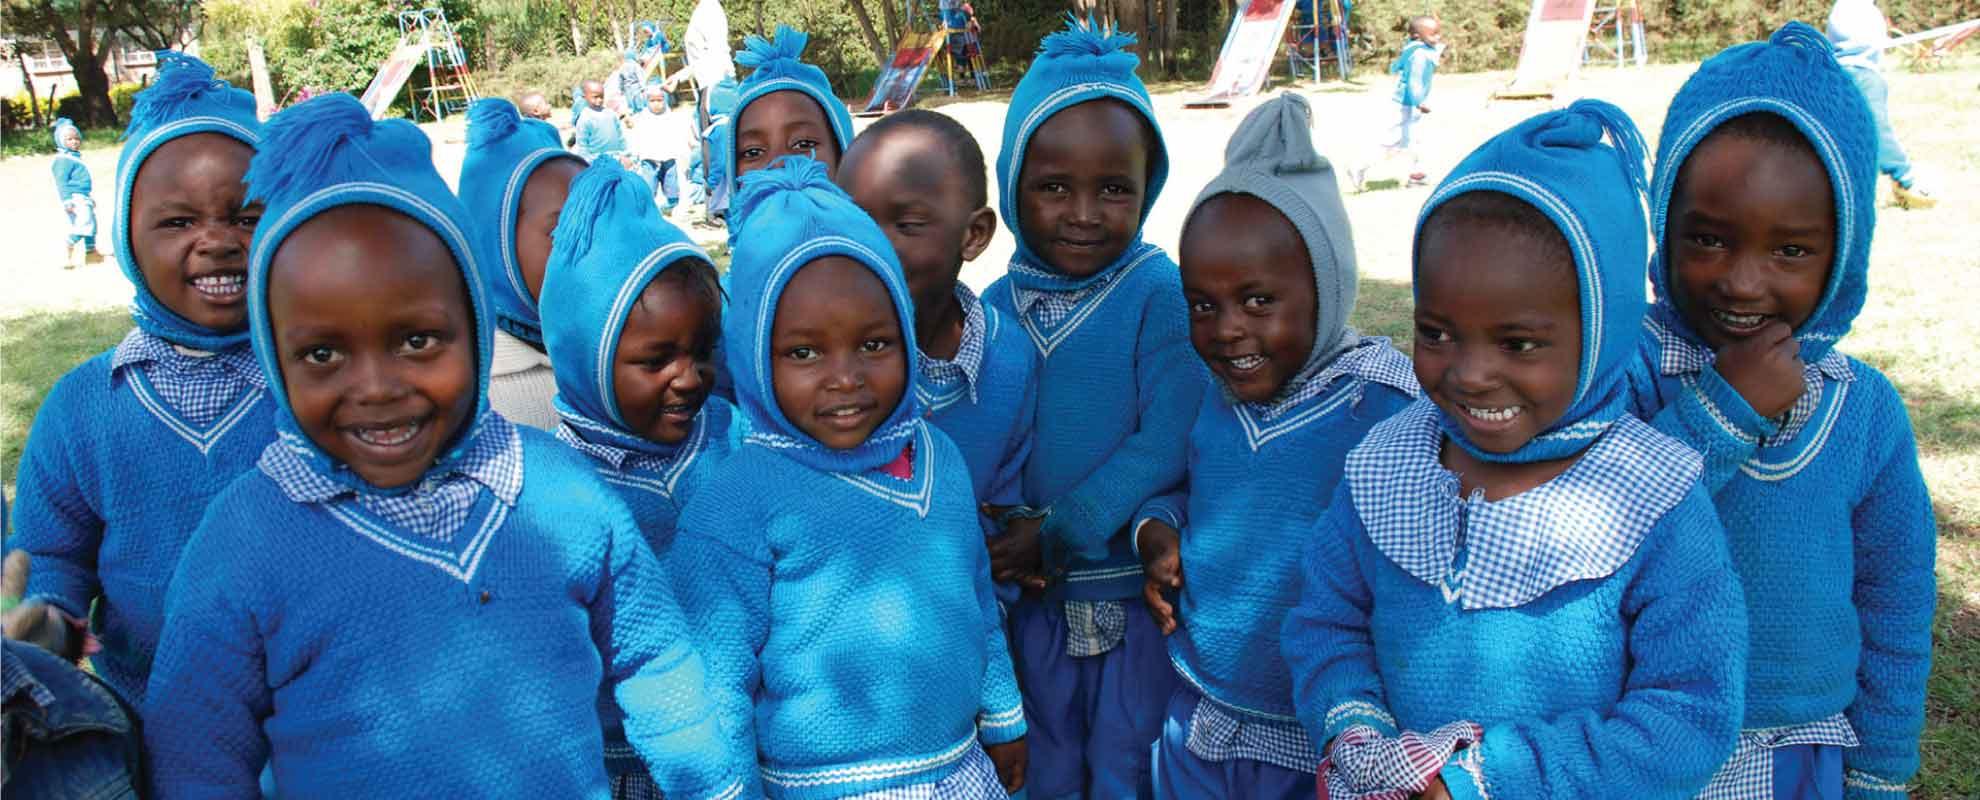 bambini-gruppo-africa